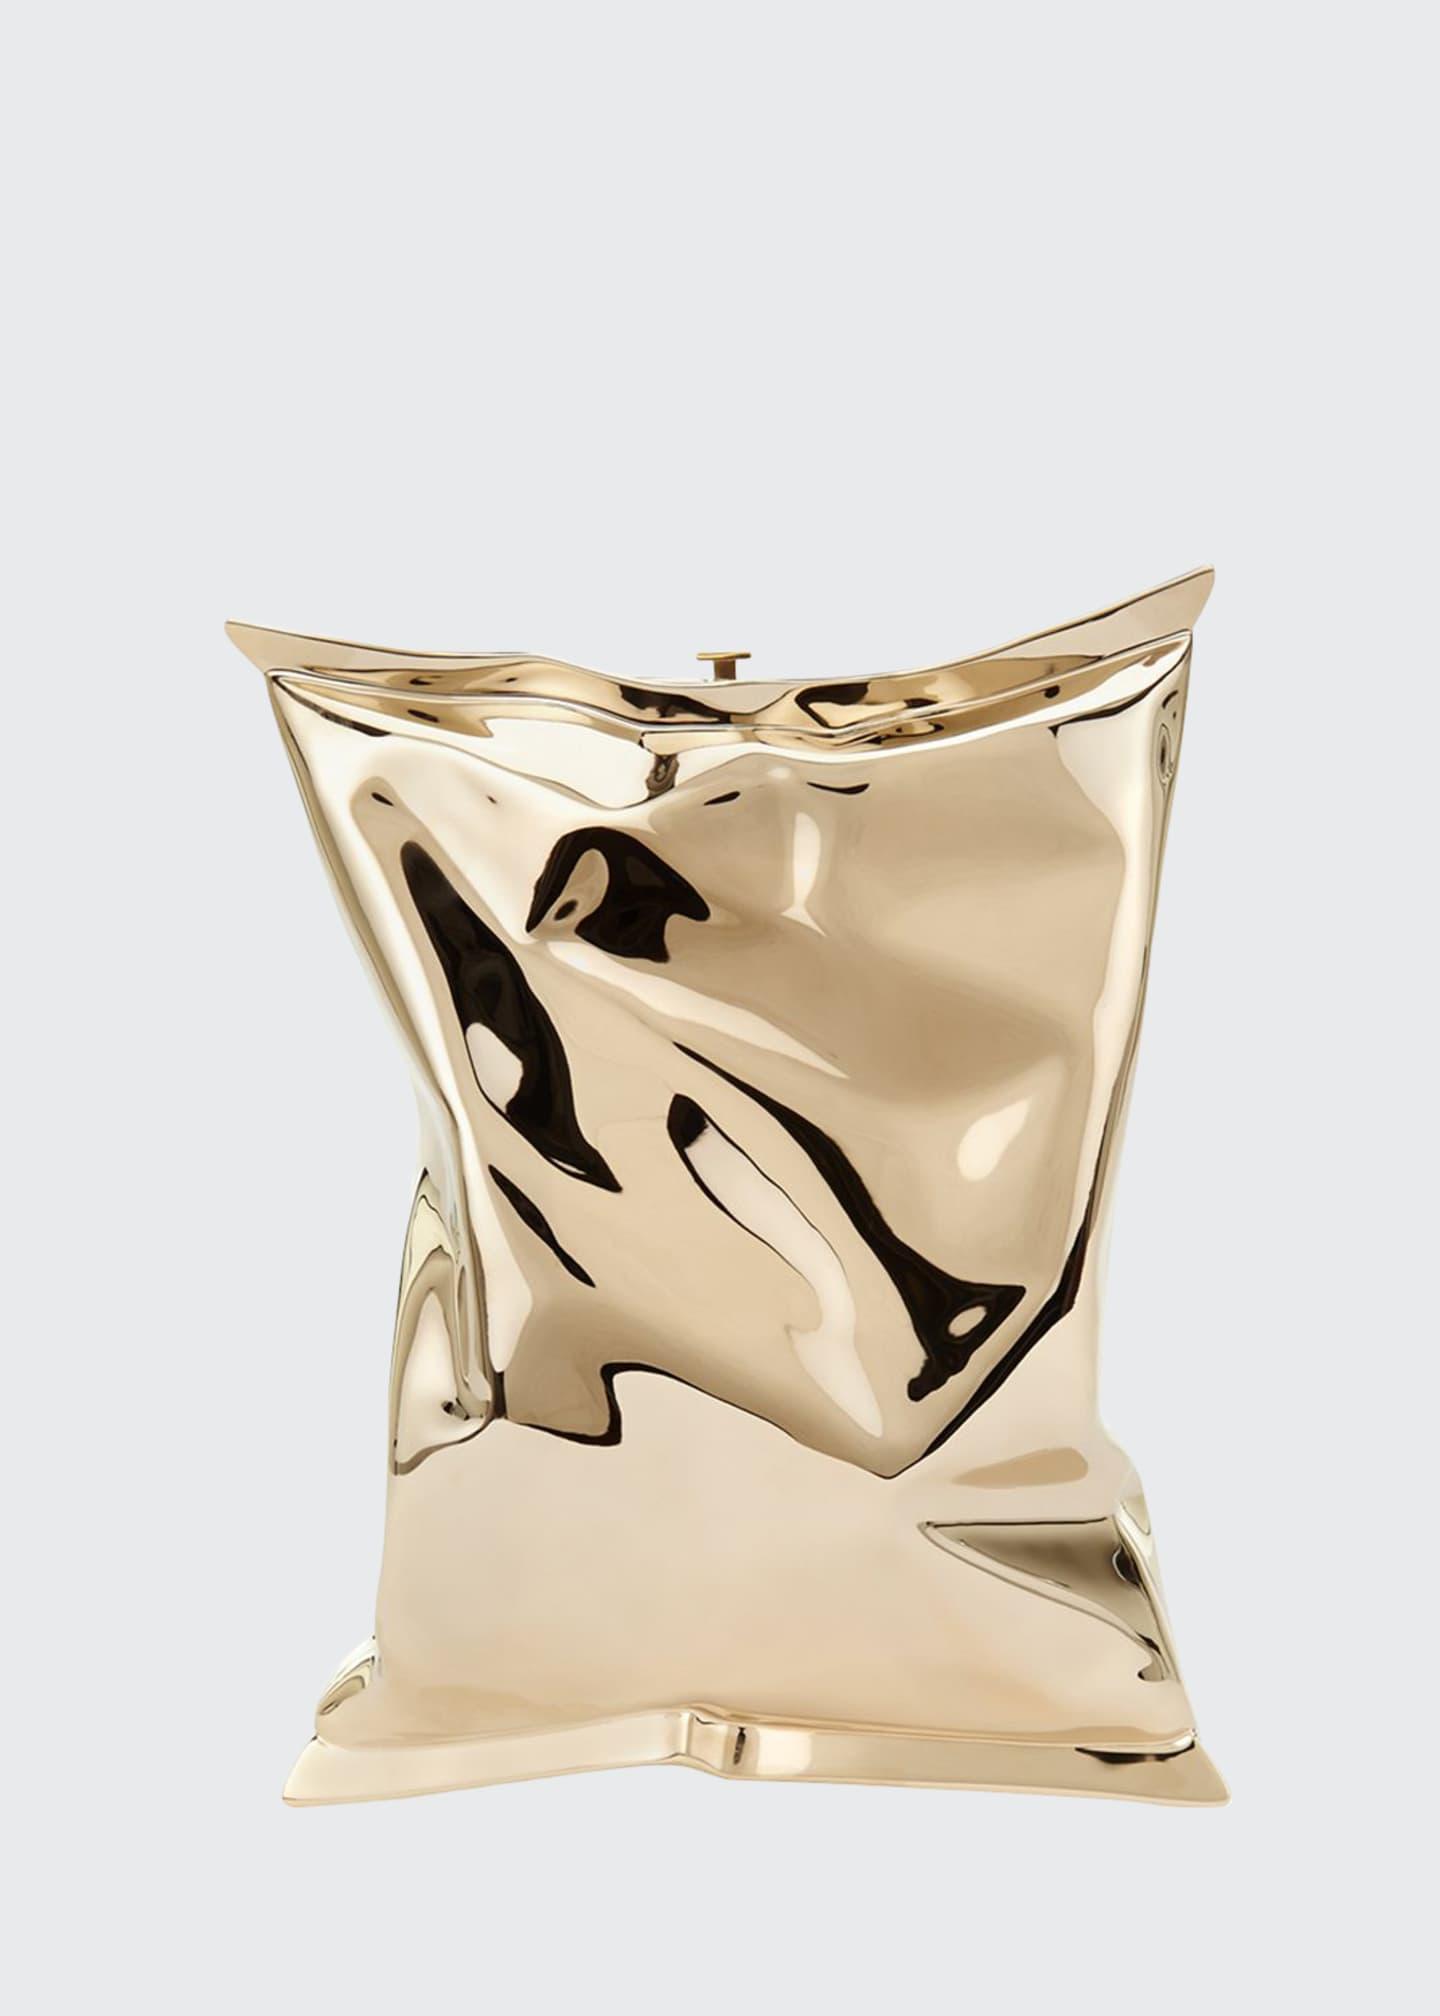 Anya Hindmarch Crisp Packet Metal Clutch Bag, Golden